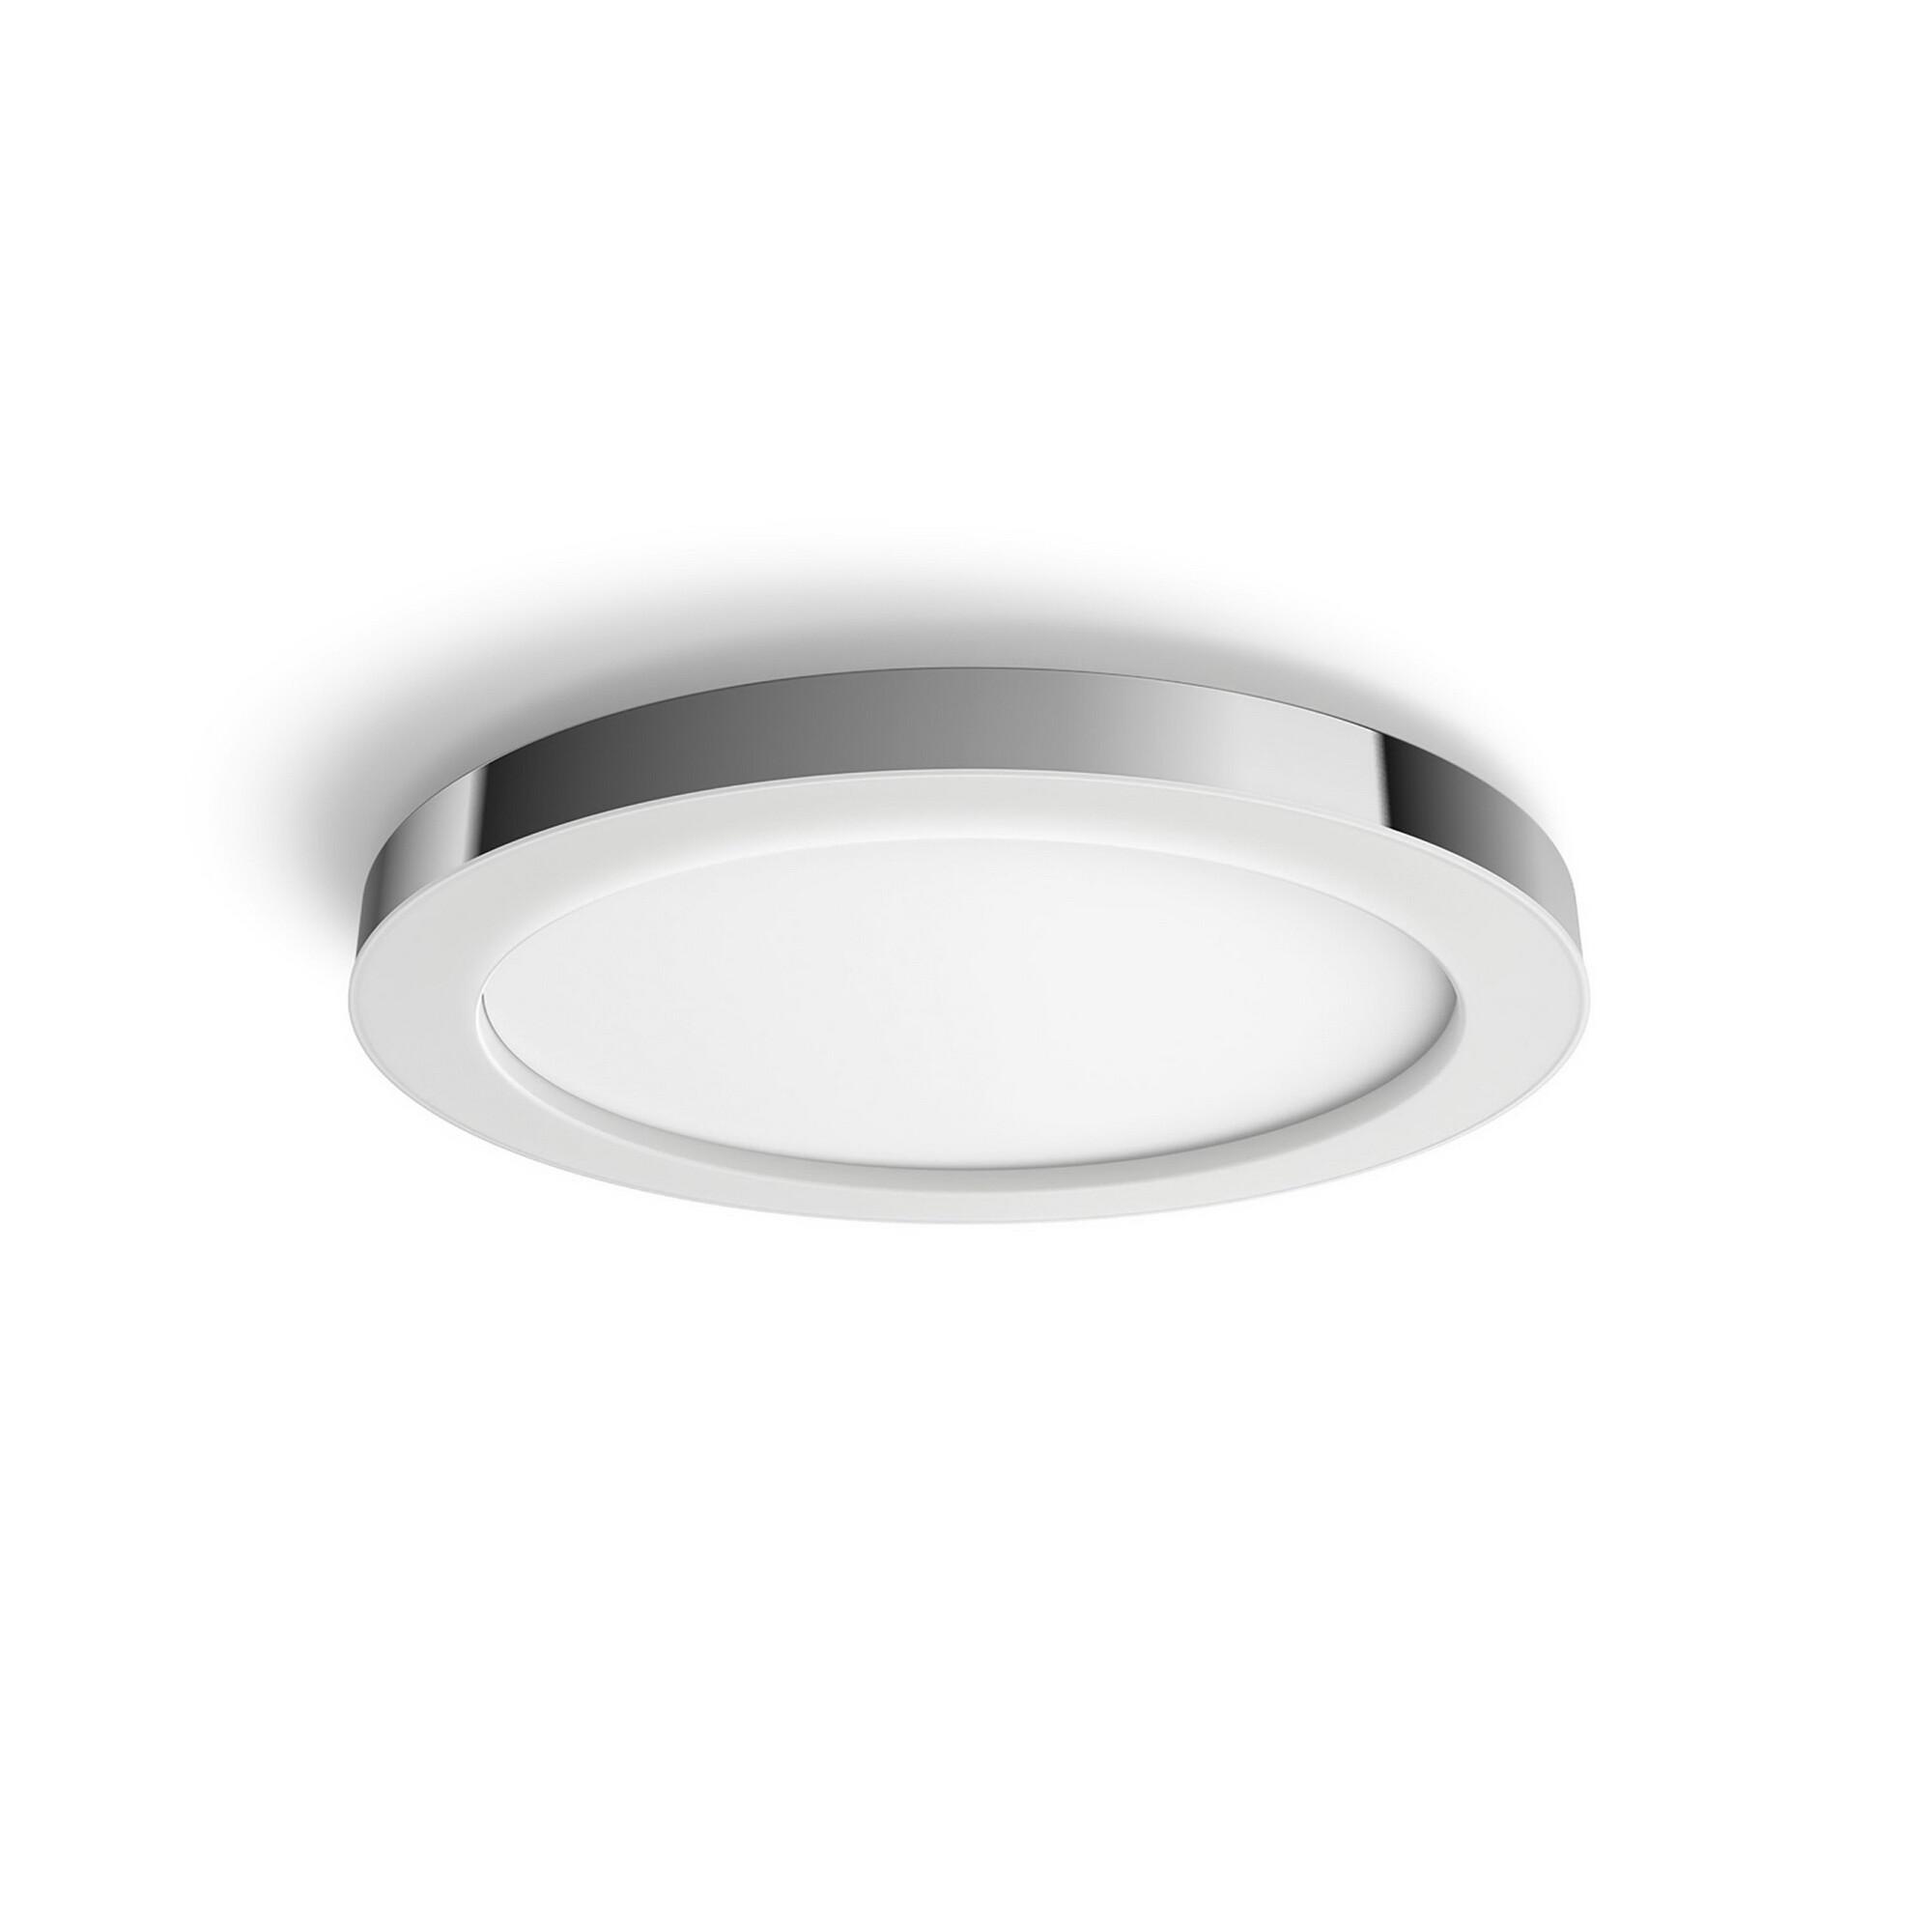 Philips HUE ADORE Plafonnier LED 1x40W/2400lm Argent